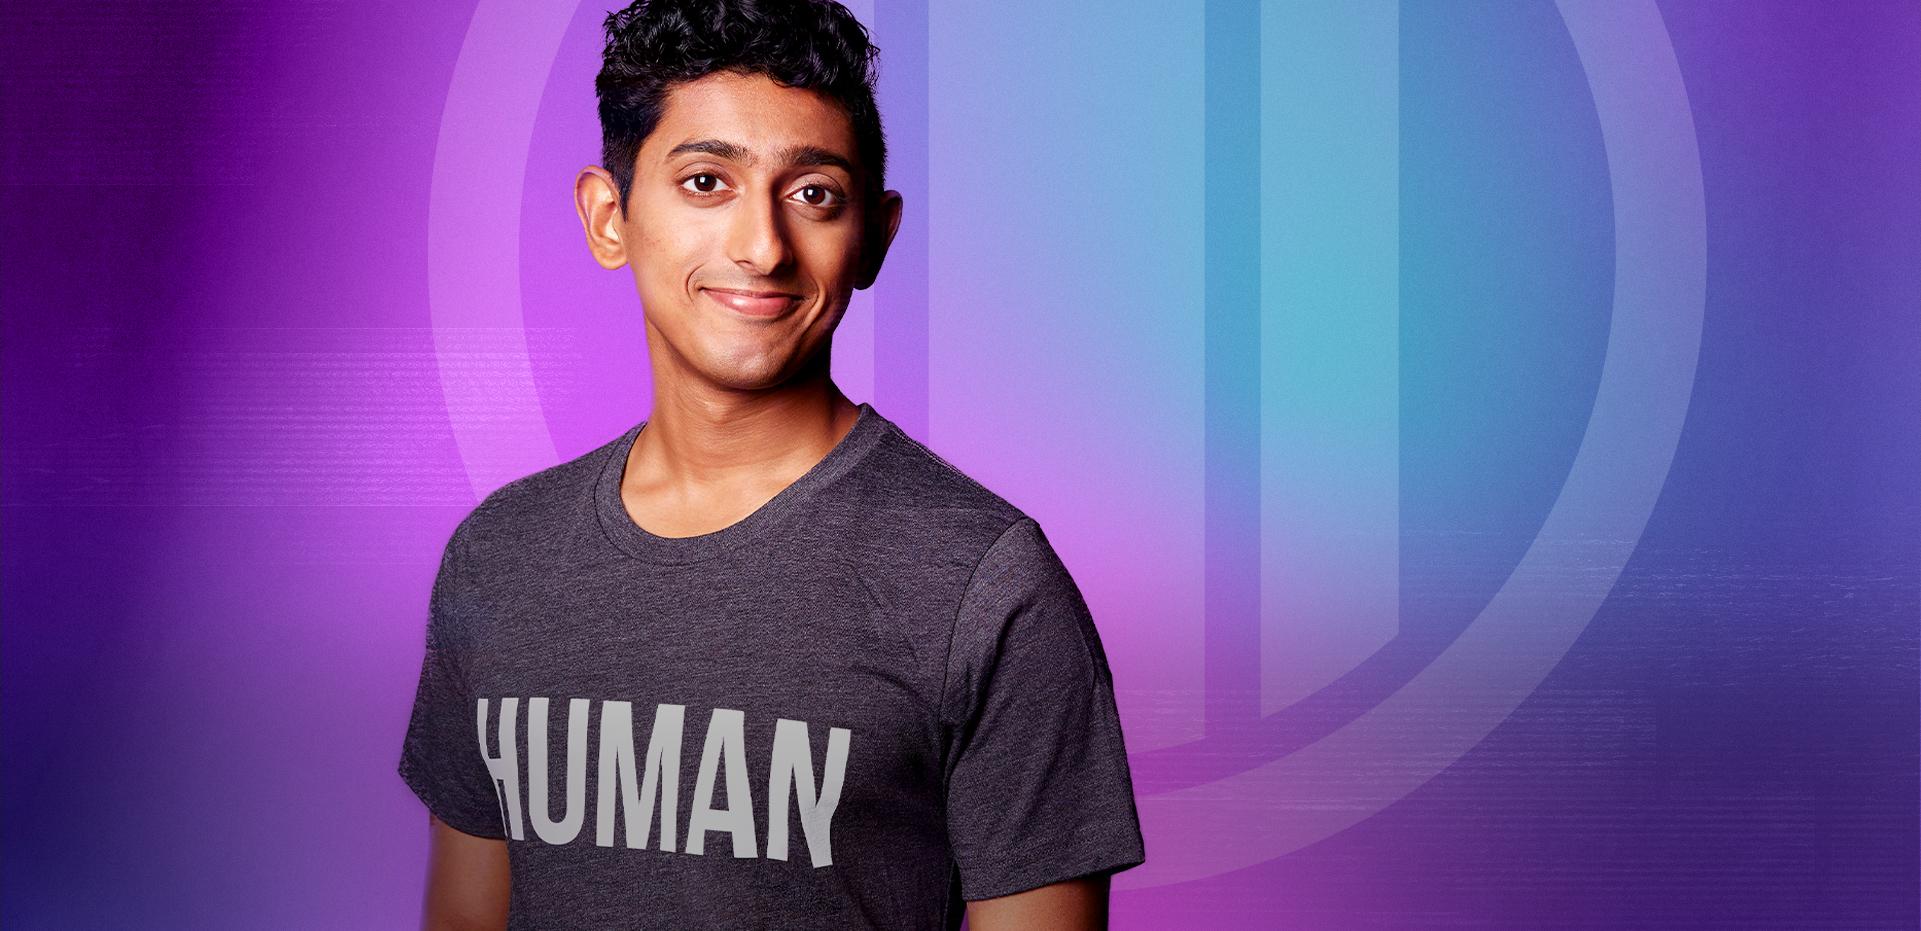 Human - Ananth